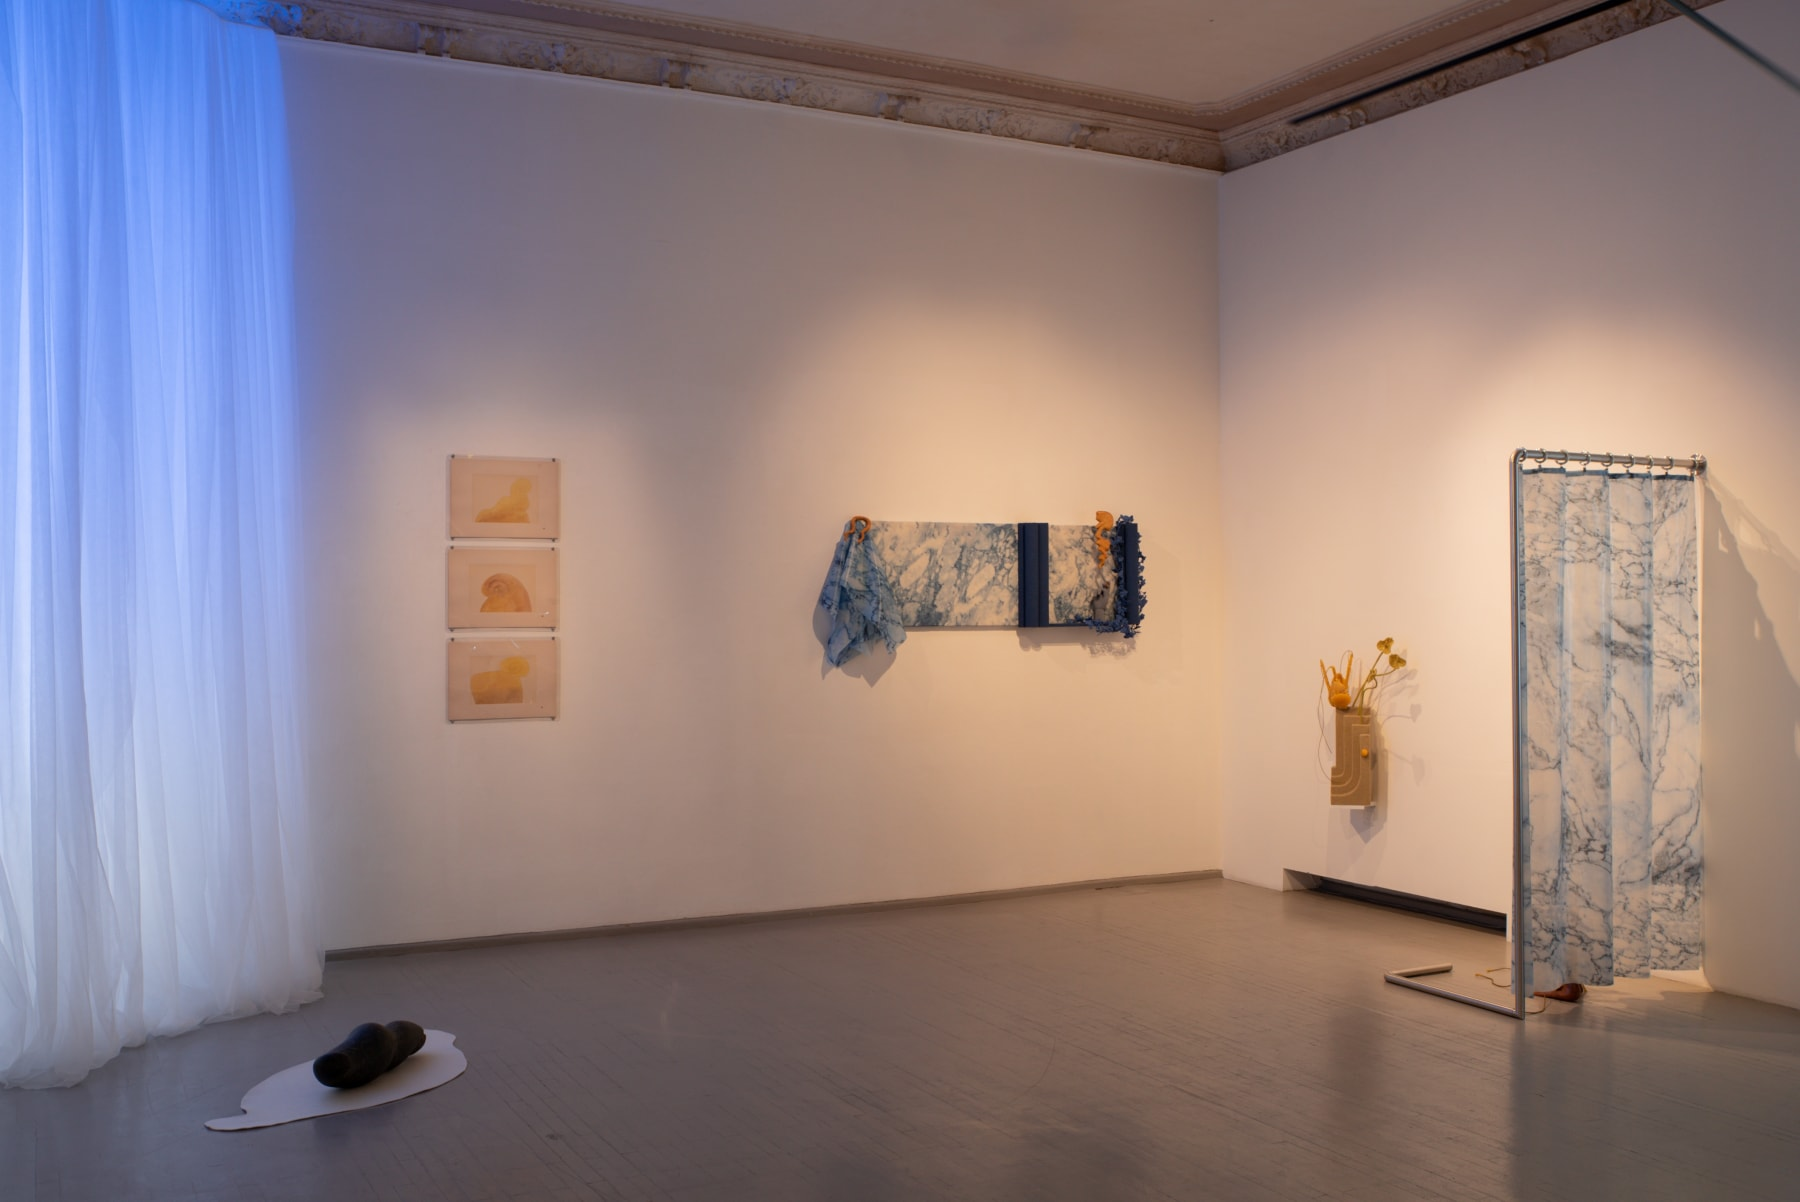 L'ÉTREINTE - EMBRACEMENT – GLAMONĖ Installation view Photographed by Laurynas Skeisgiela